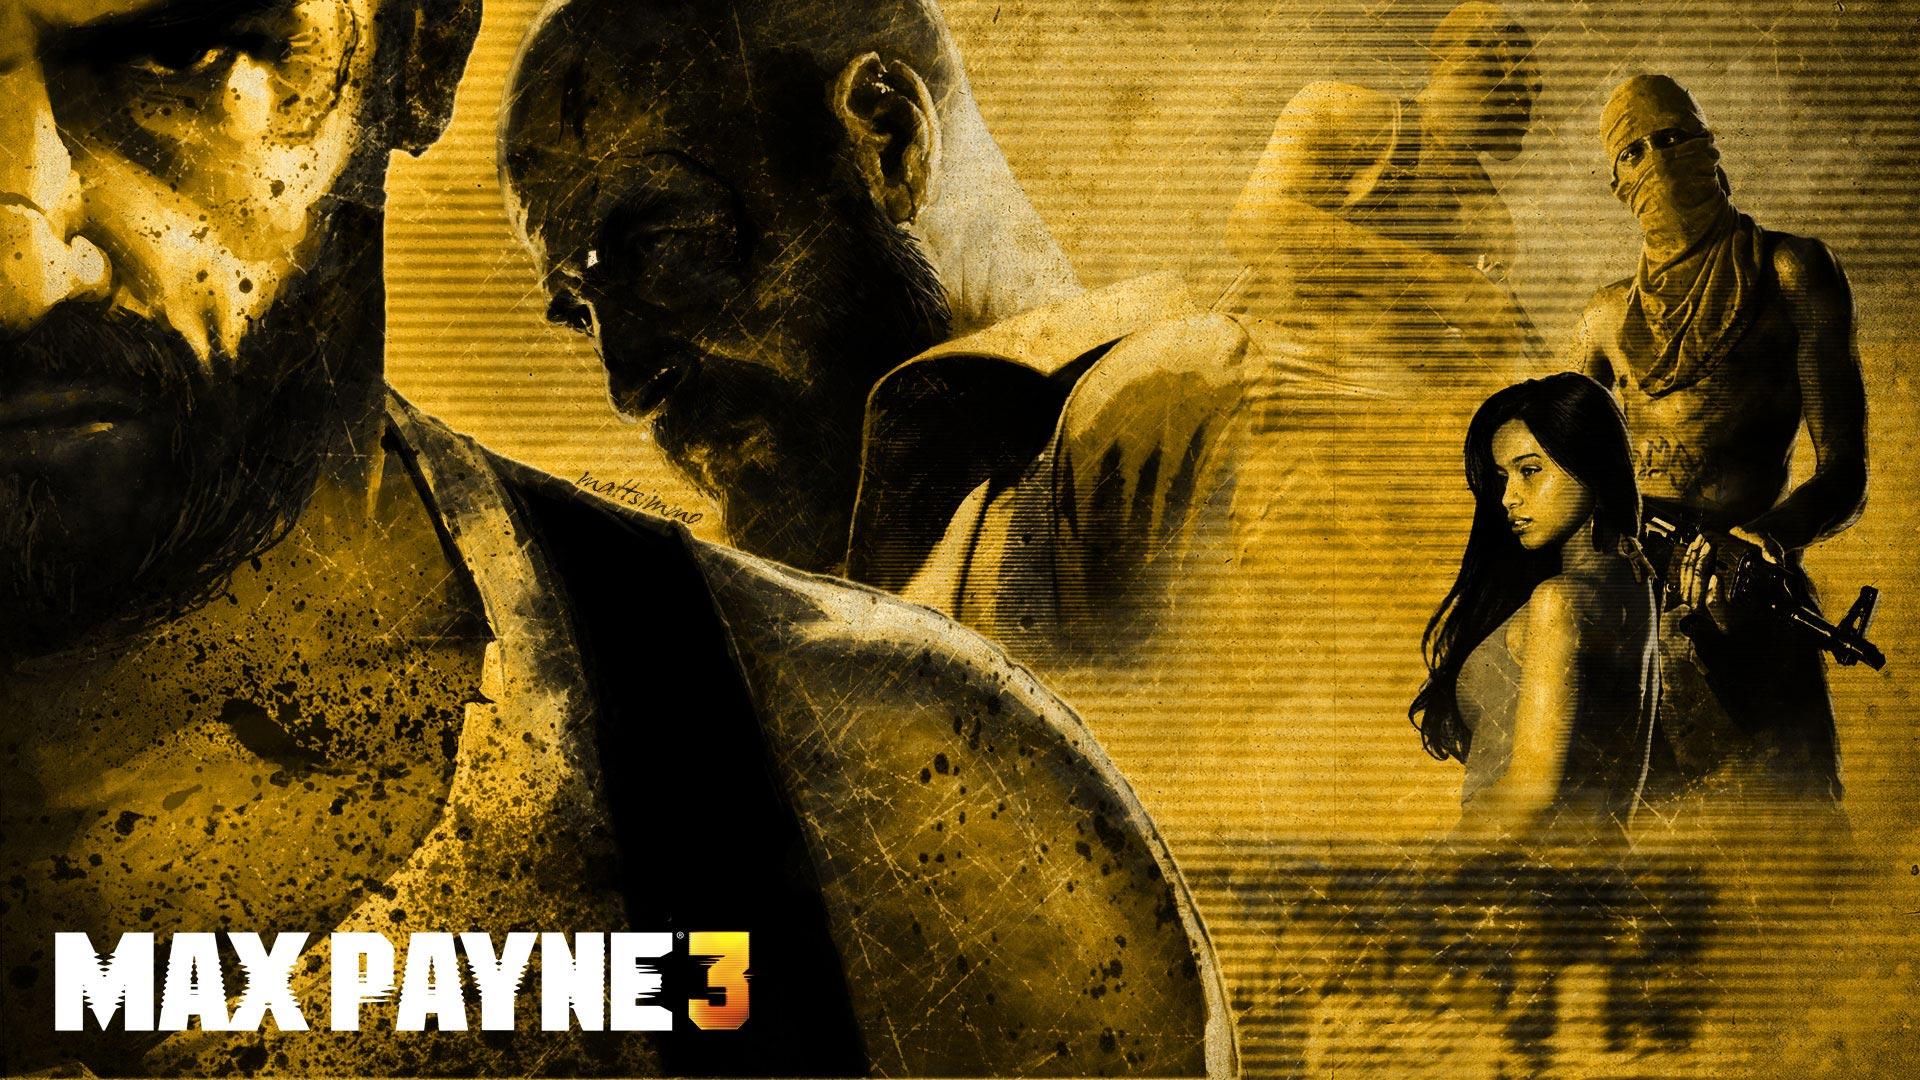 Games Wallpapers   Max Payne 3 1920x1080 wallpaper 1920x1080